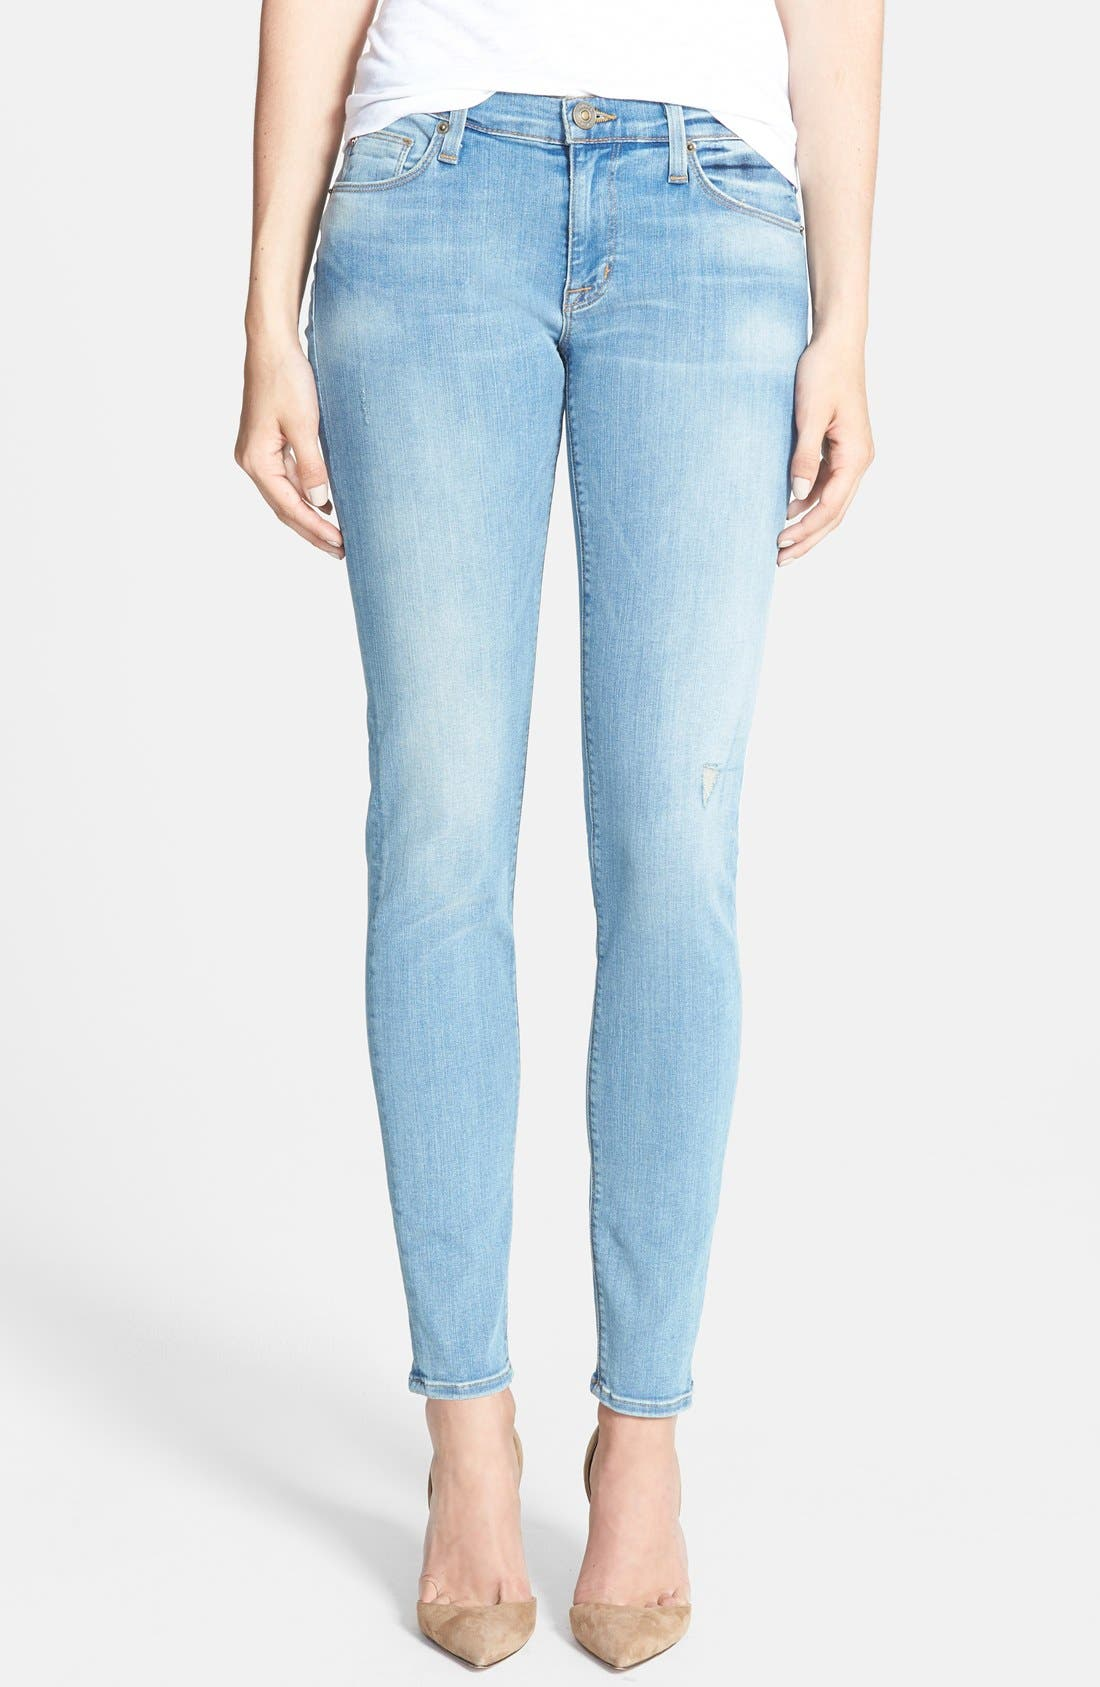 Alternate Image 1 Selected - Hudson Jeans 'Krista' Super Skinny Jeans (Mischief)